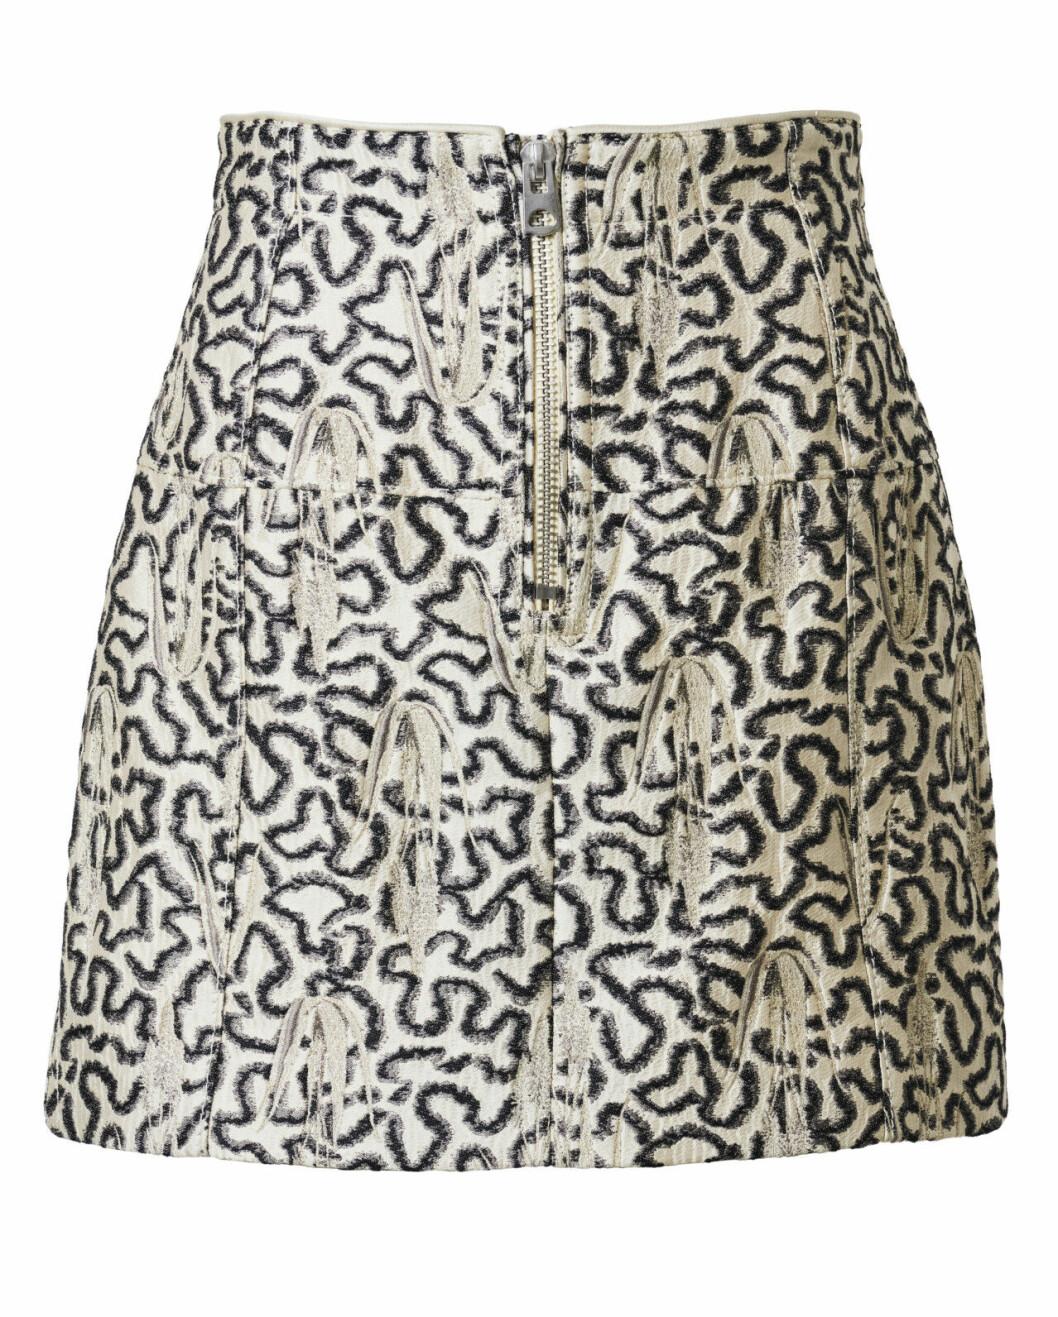 H&M Conscious Exclusive 2019 mönstrad kort kjol